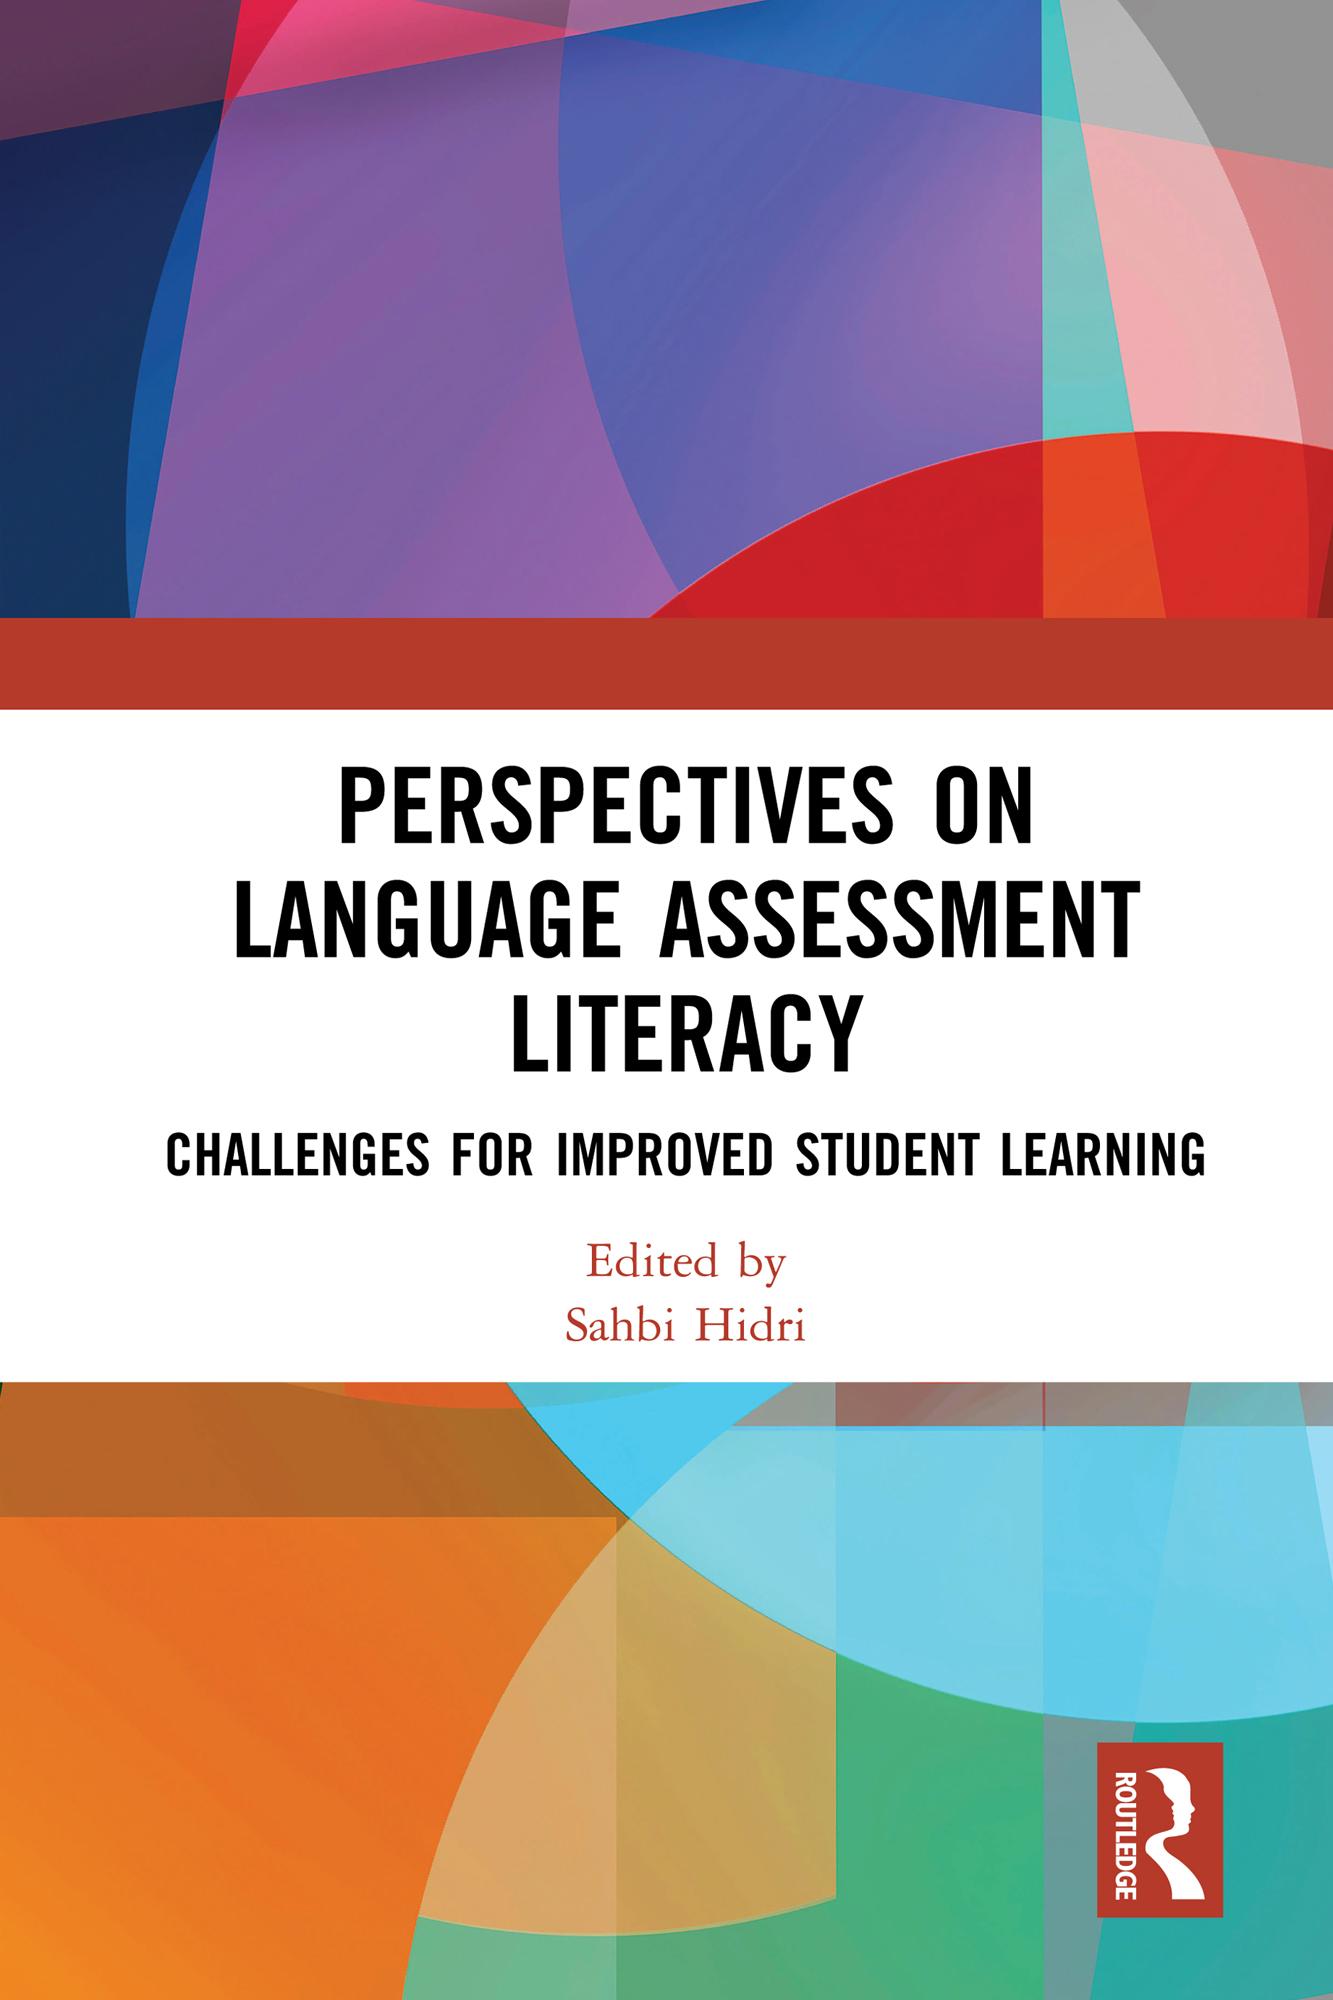 Enhancing assessment literacy through feedback and feedforward